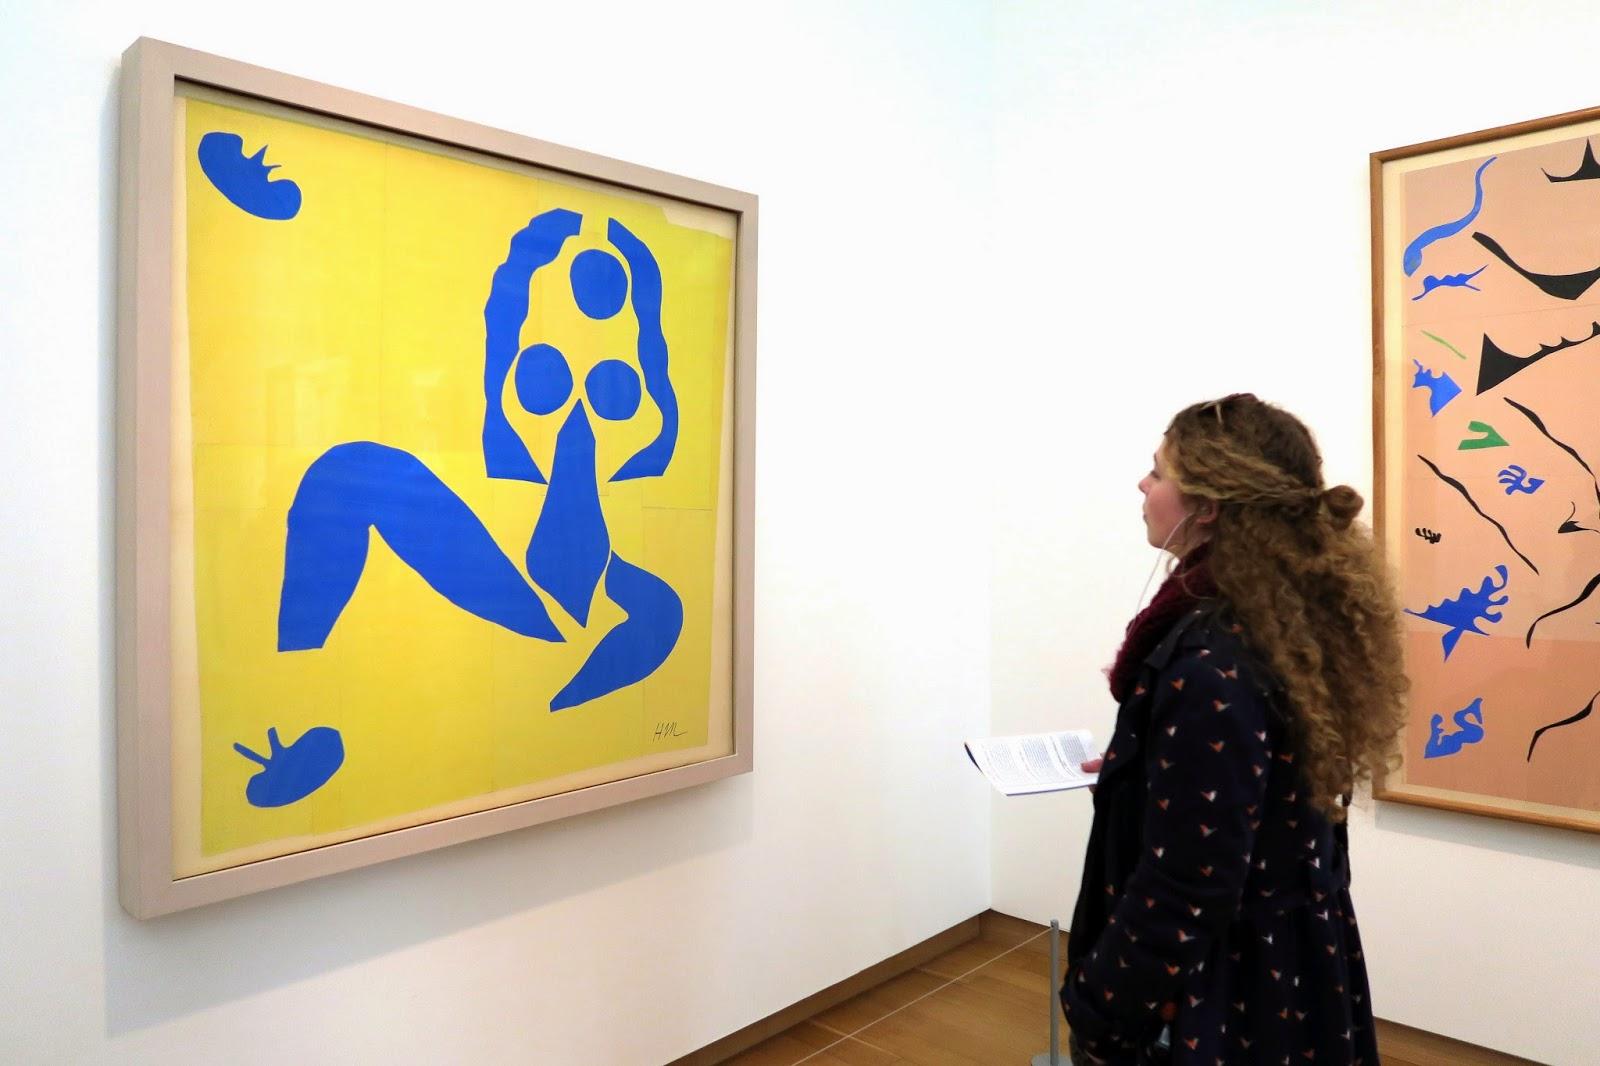 Johan 39 s fotoblog matisse for Matisse fenetre a tahiti